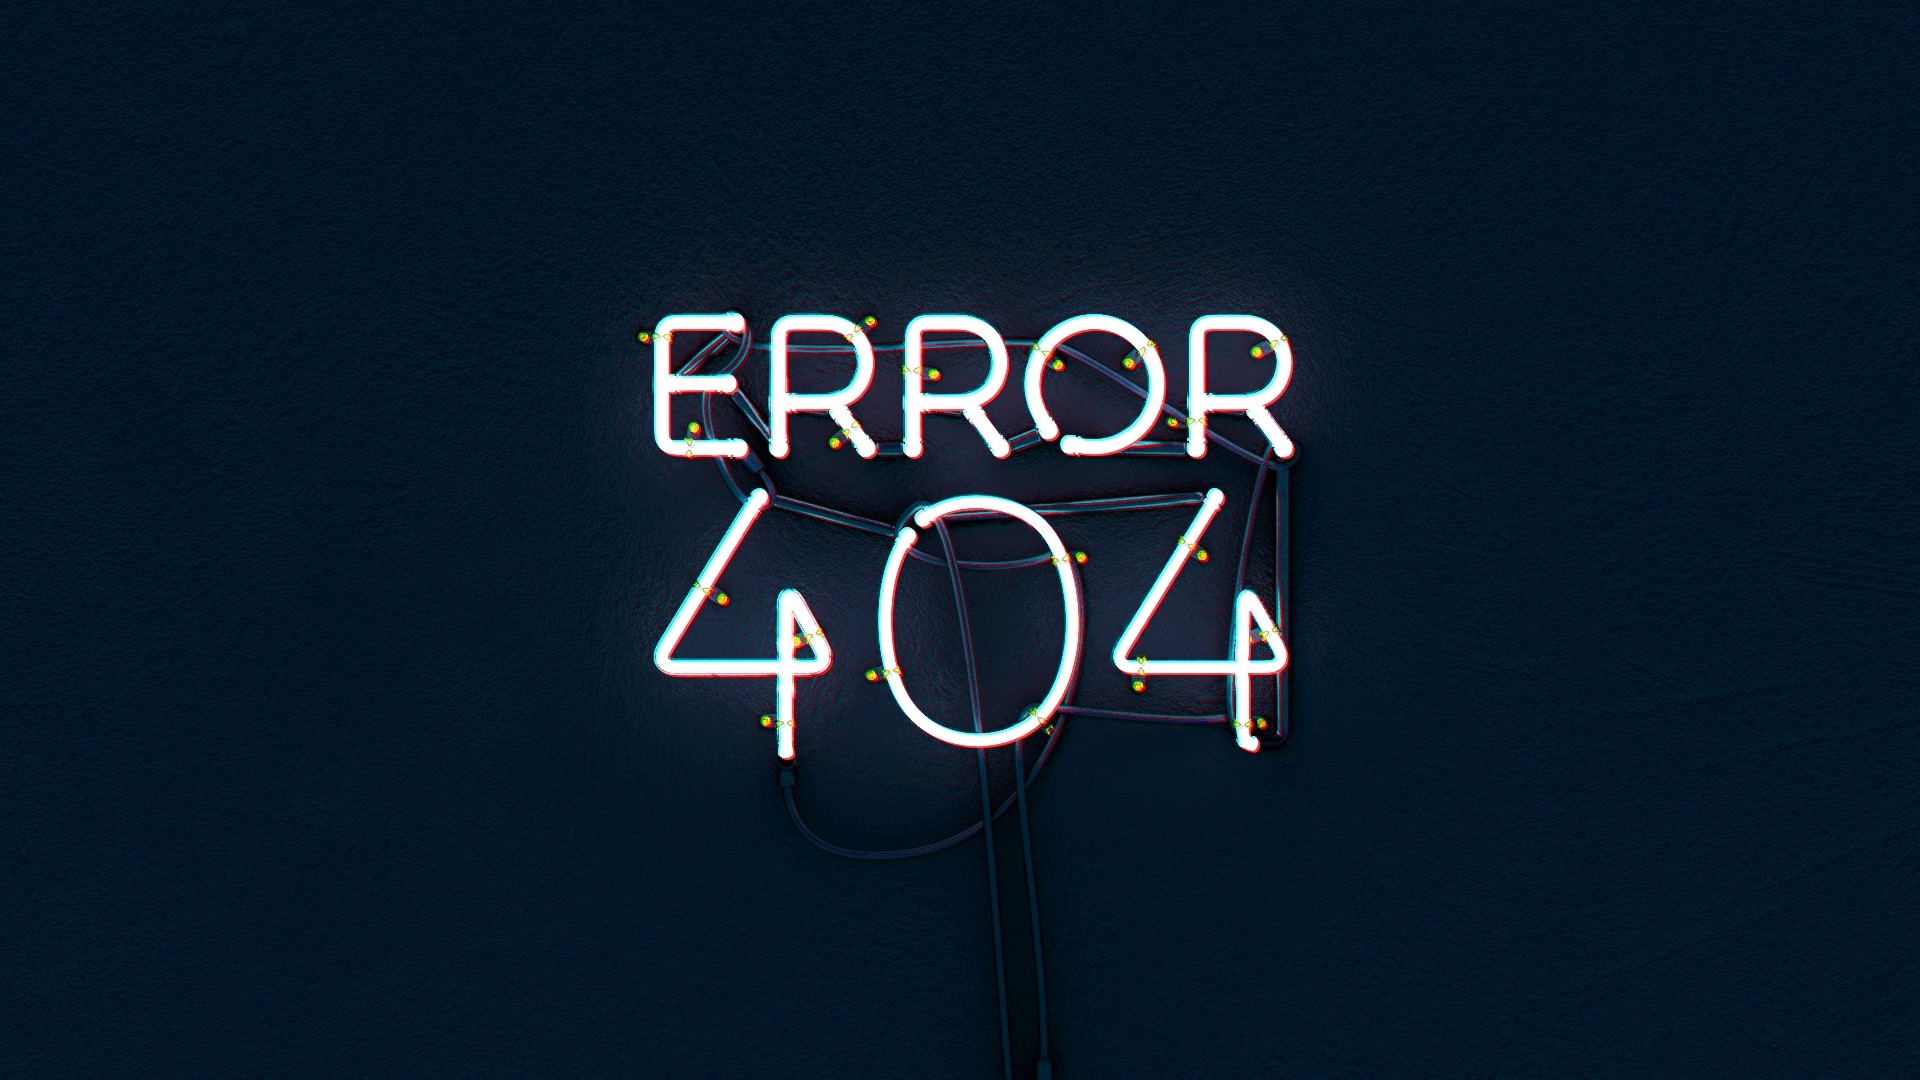 Error 404 PC Wallpaper